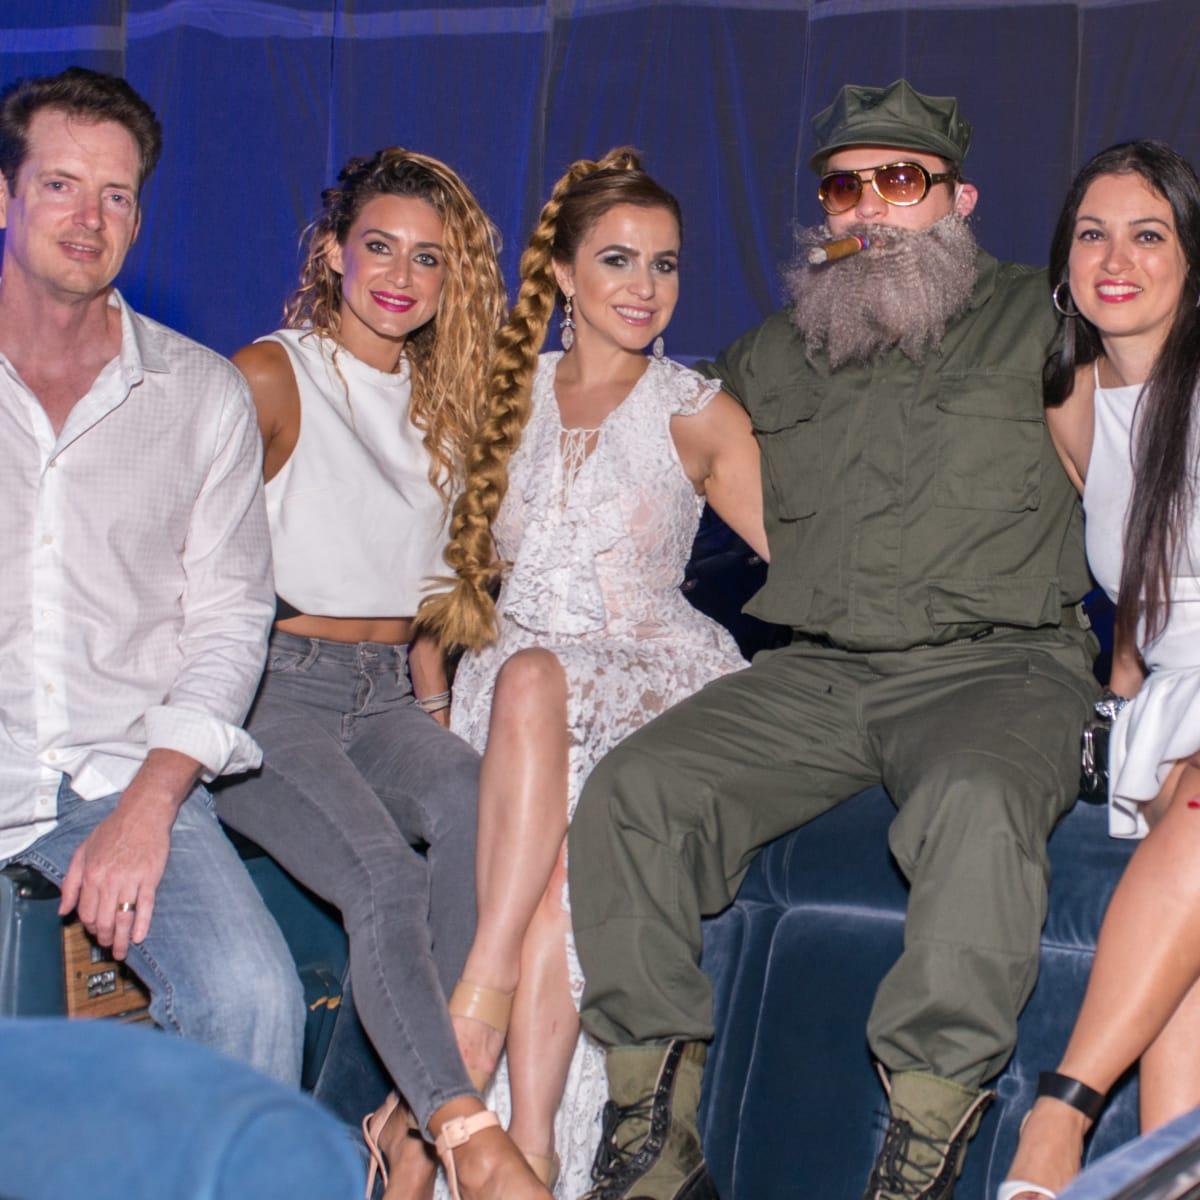 Havana Night, 7/16 David Rafferty, Katherine Sin, Shiva Rafferty, David King, Sahar Rahmani